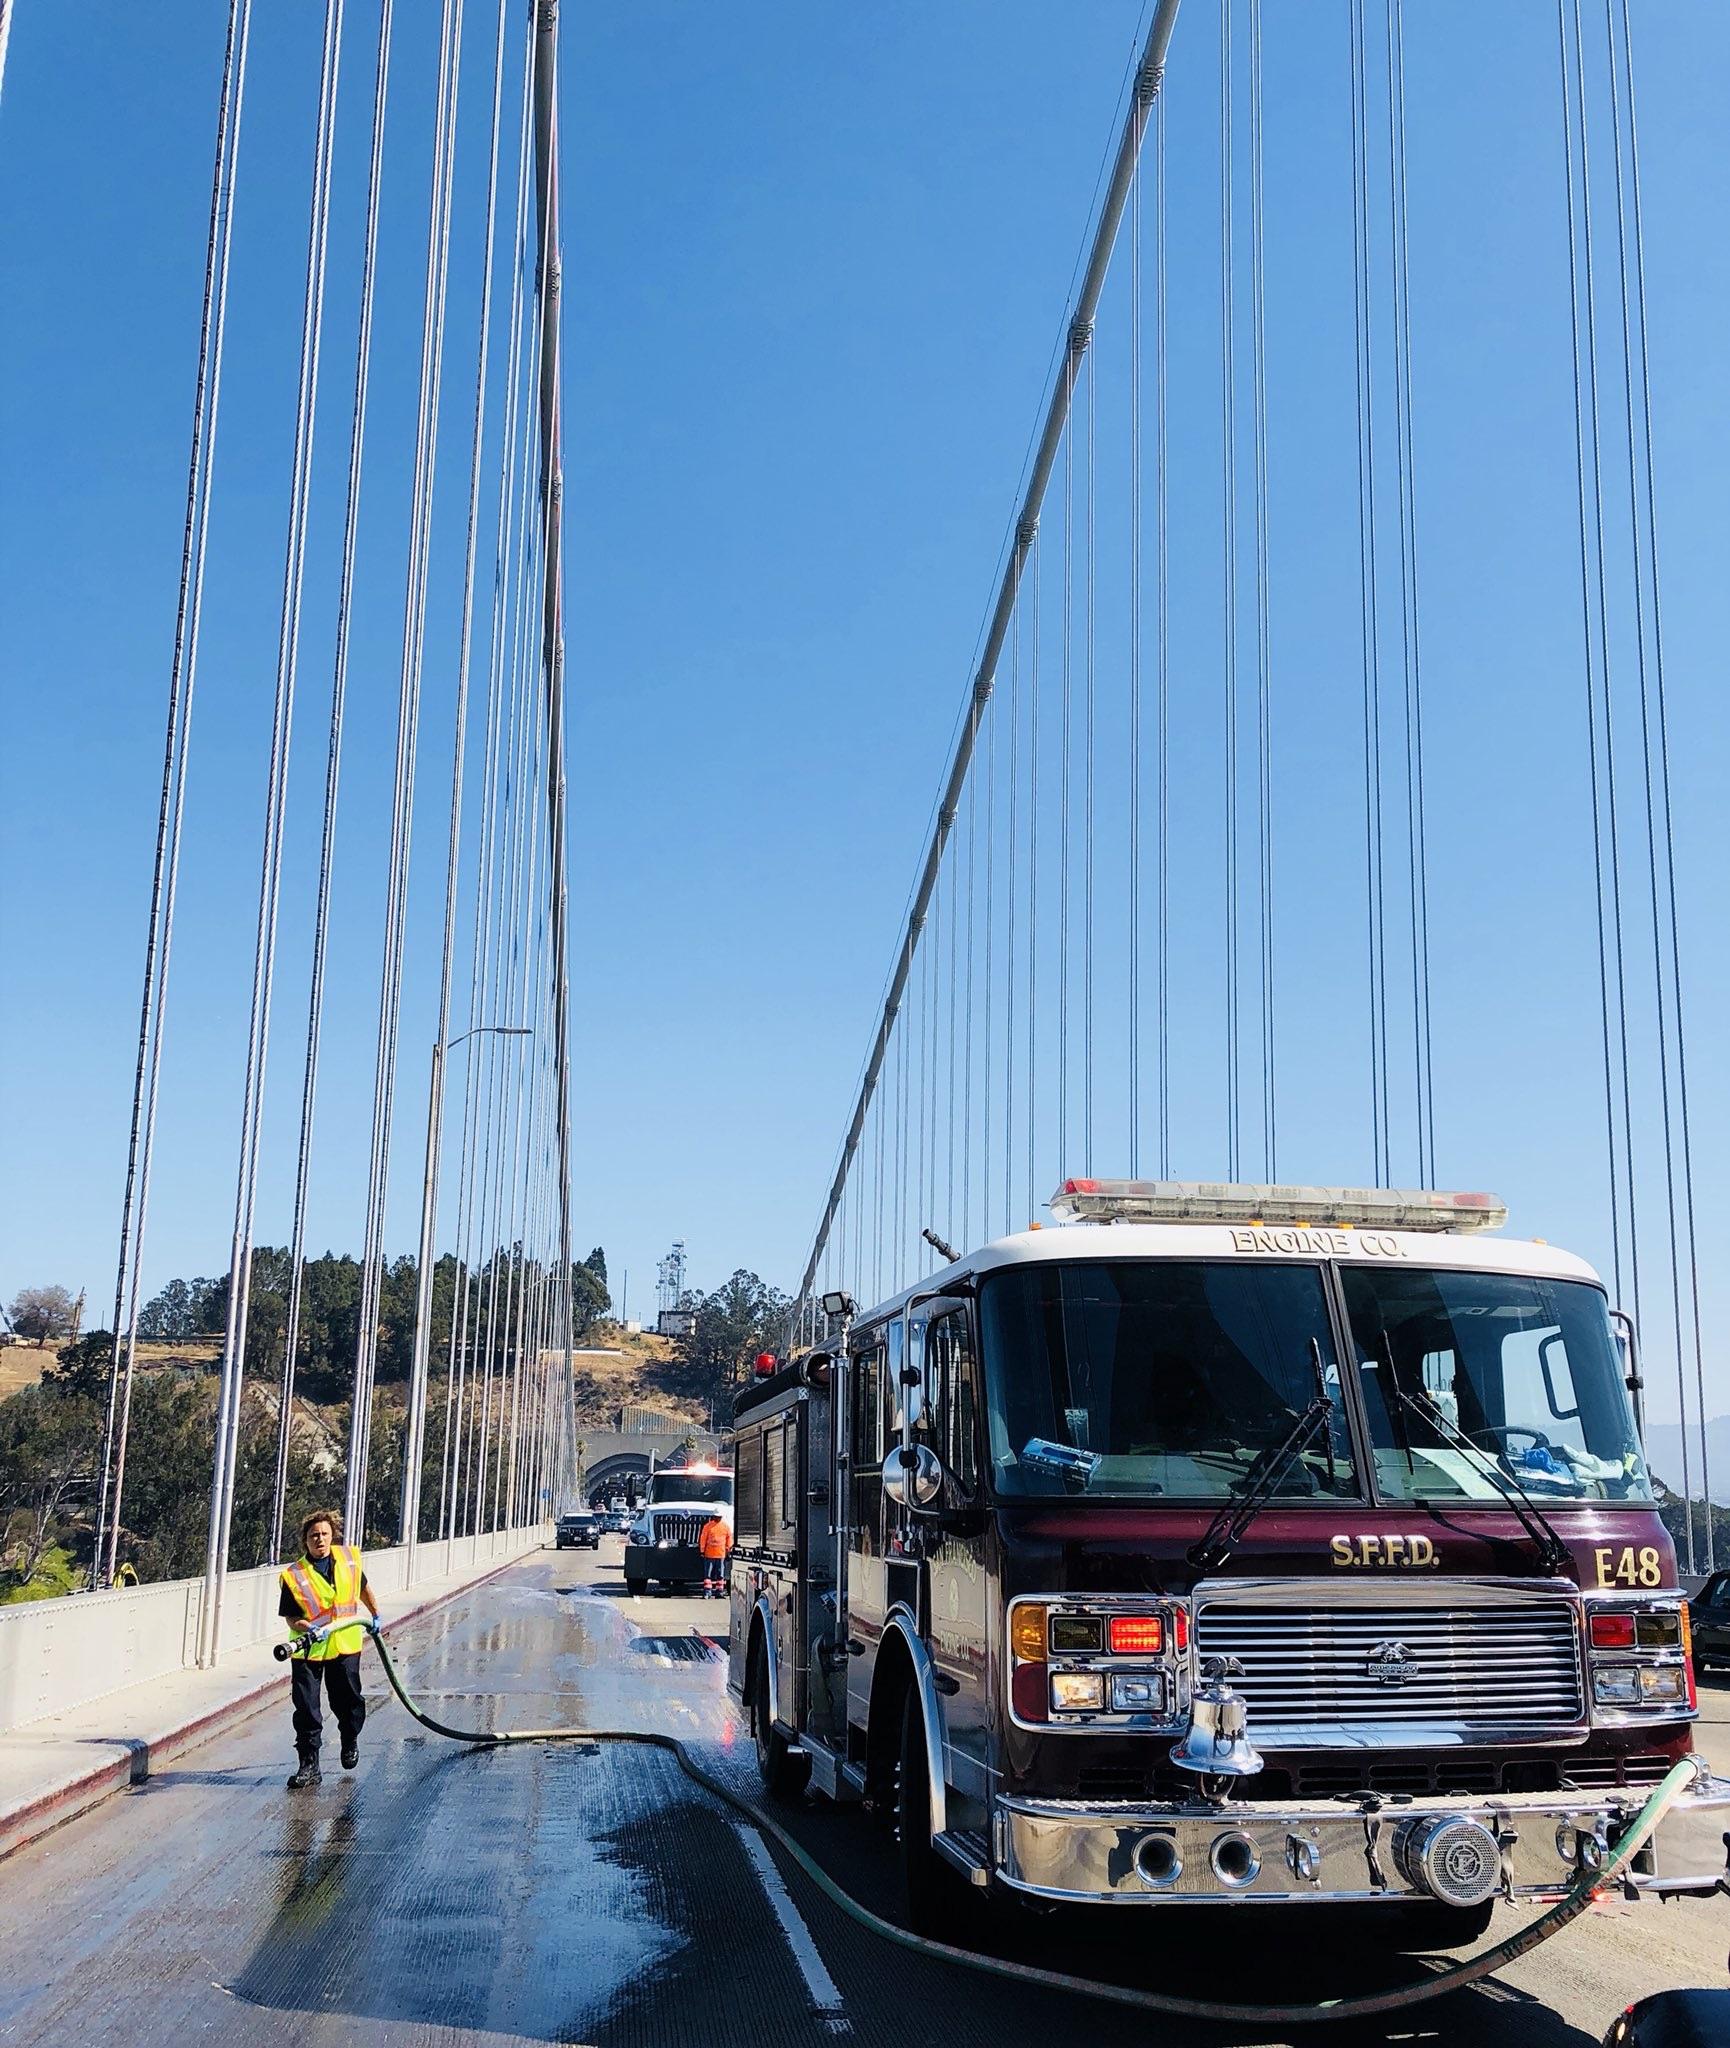 Motorcyclist Killed In Crash On Bay Bridge - San Francisco News